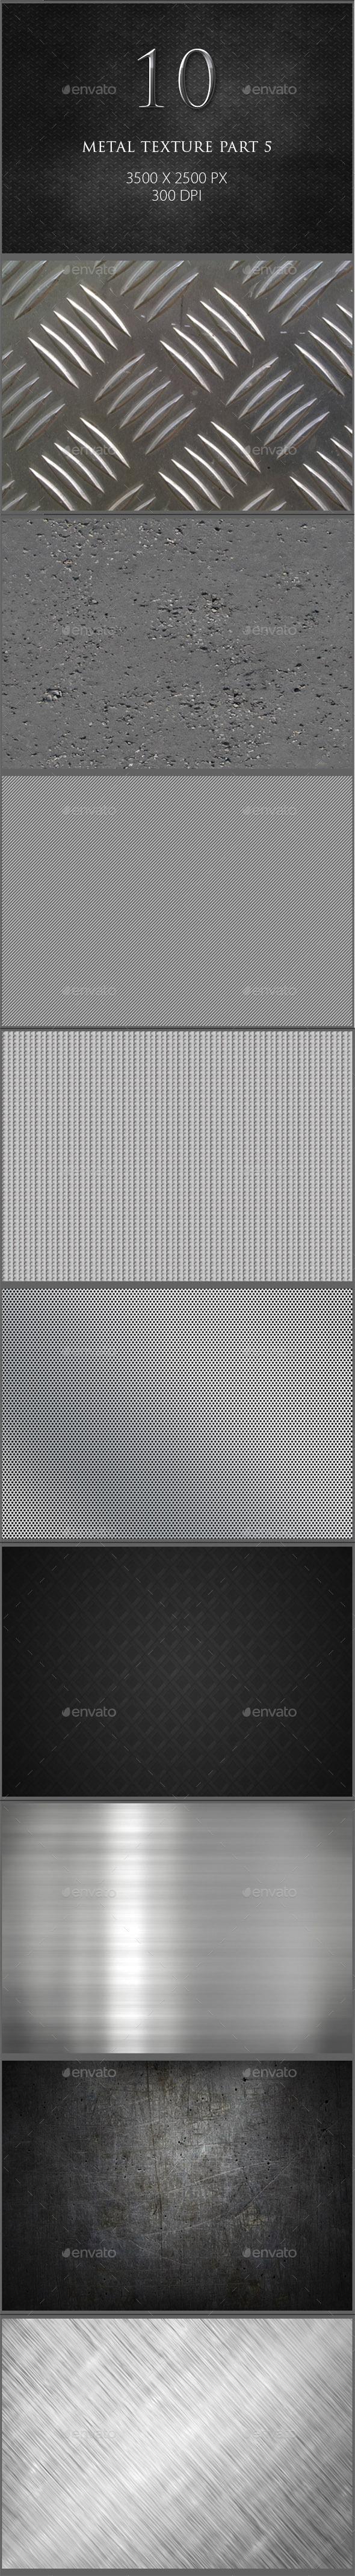 10 Metal Texture Part 5 - Metal Textures